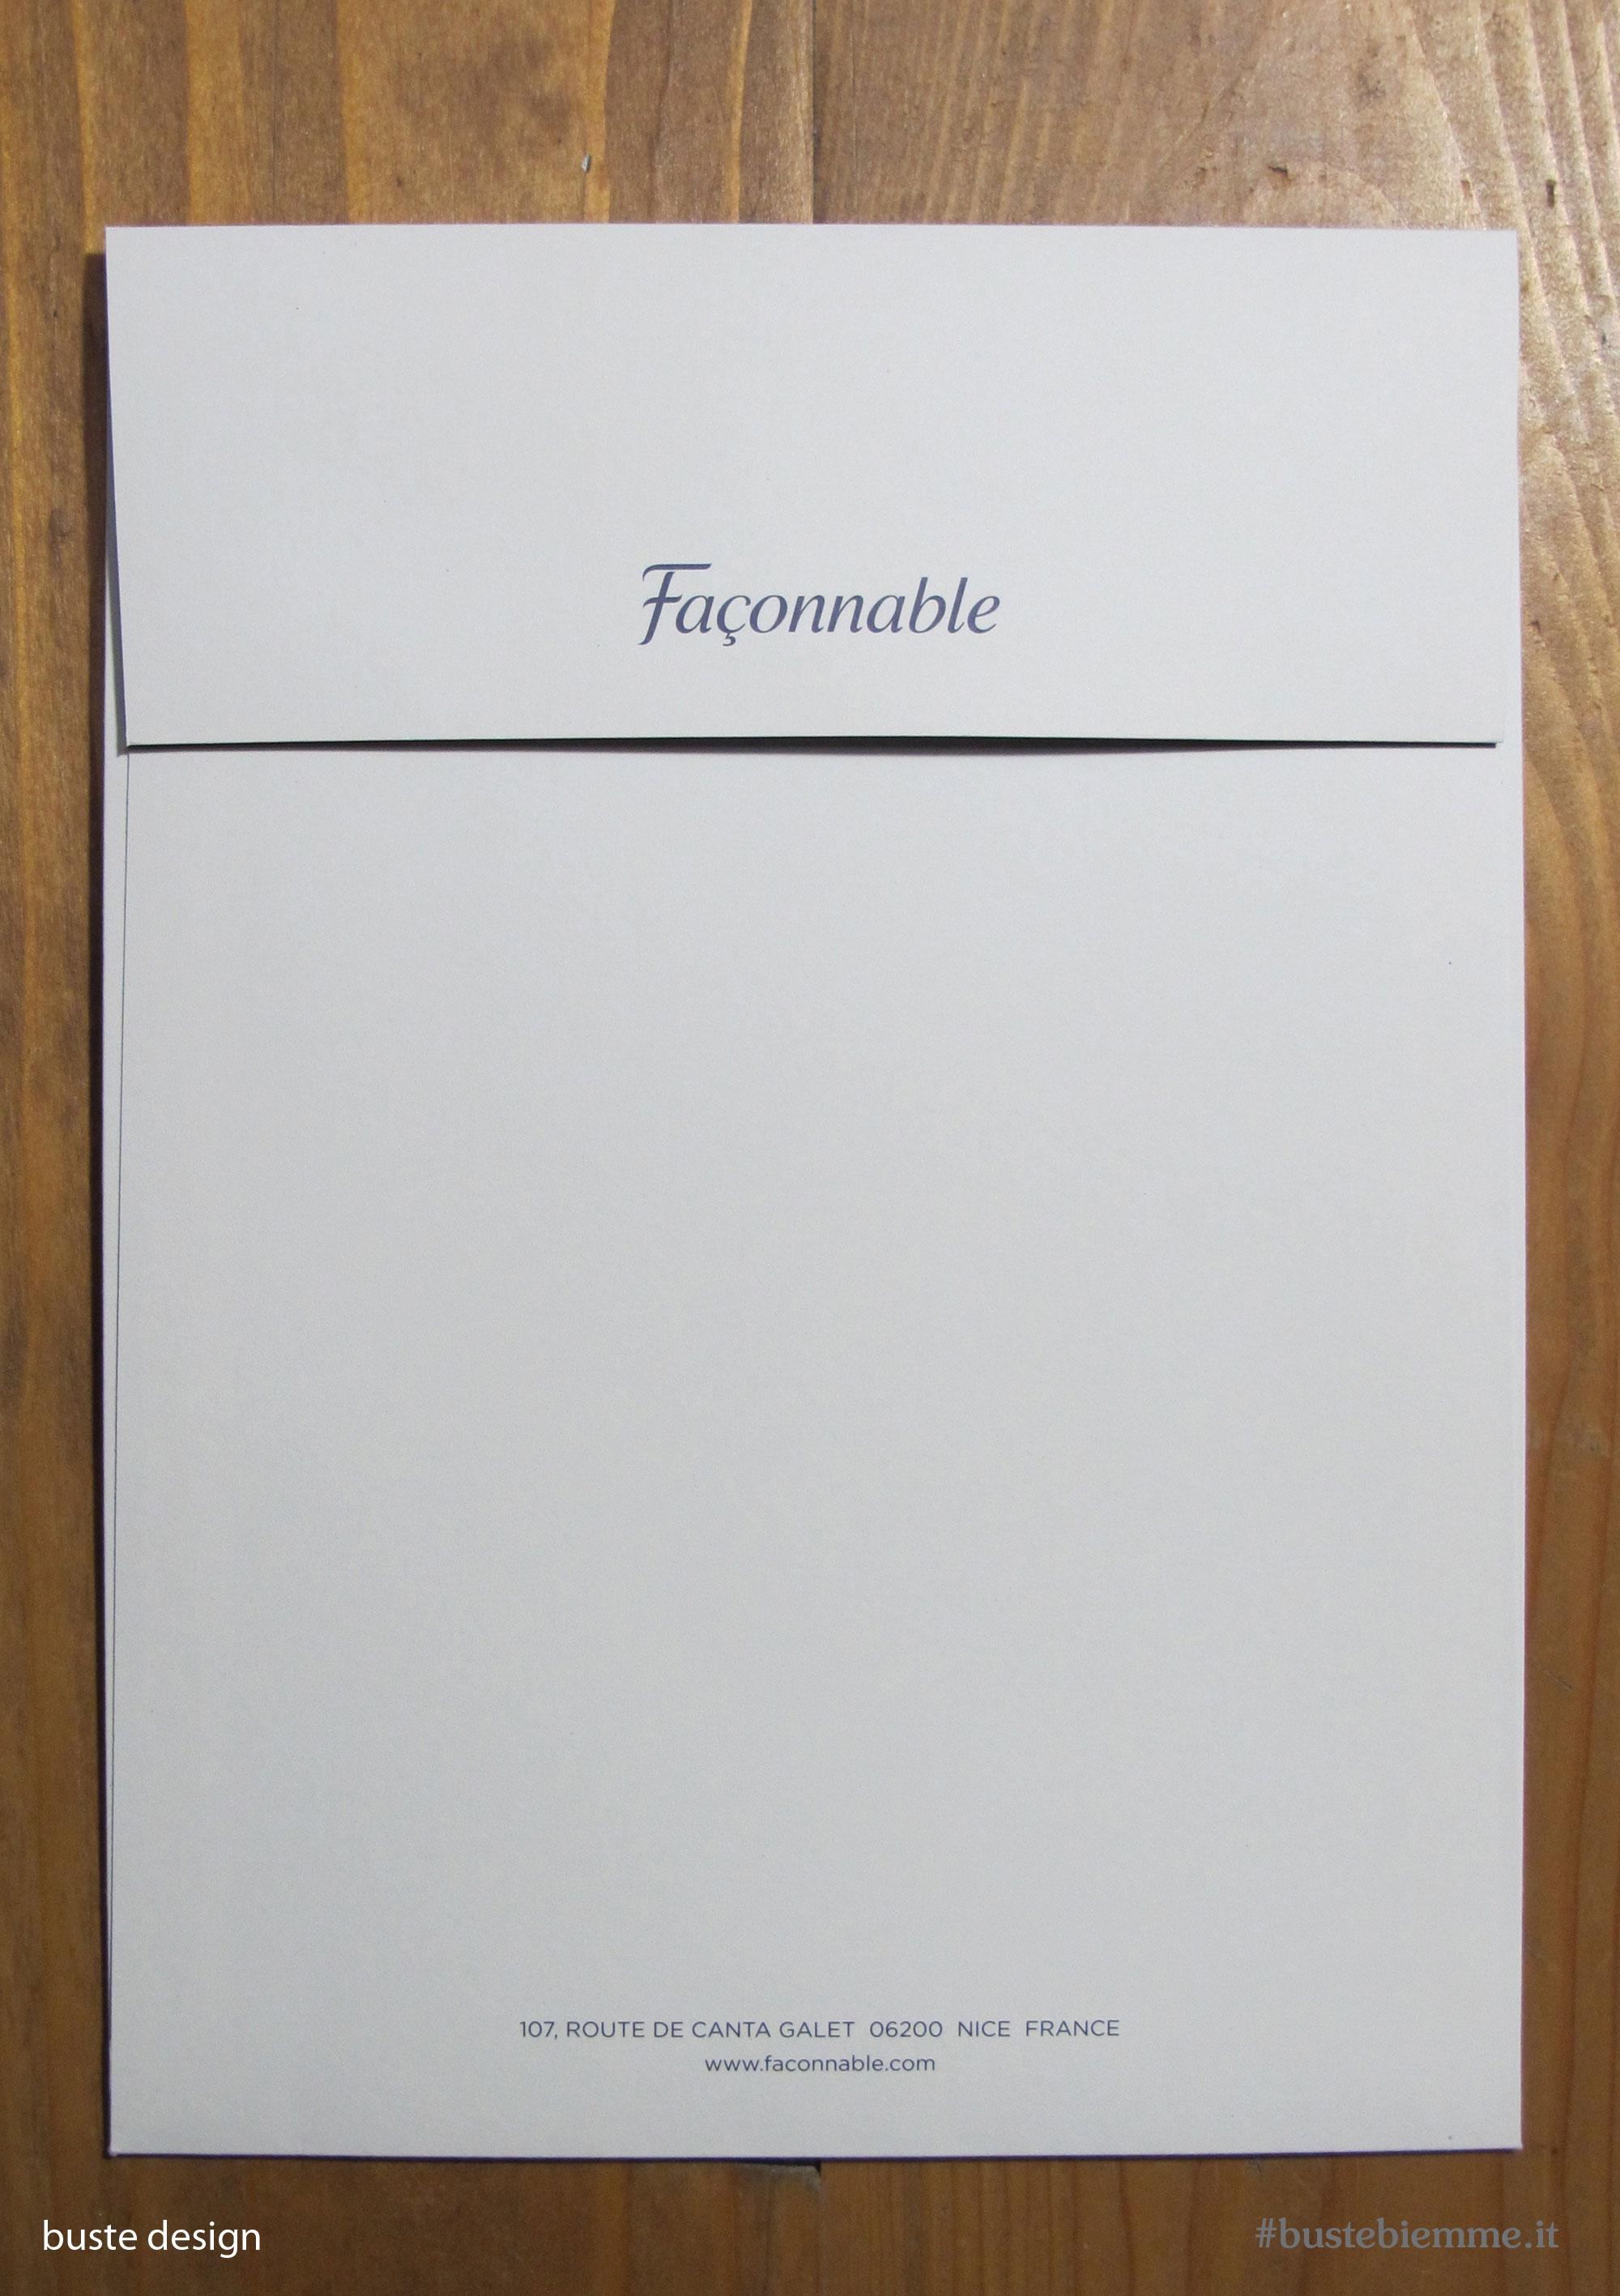 busta design con carta soft touch